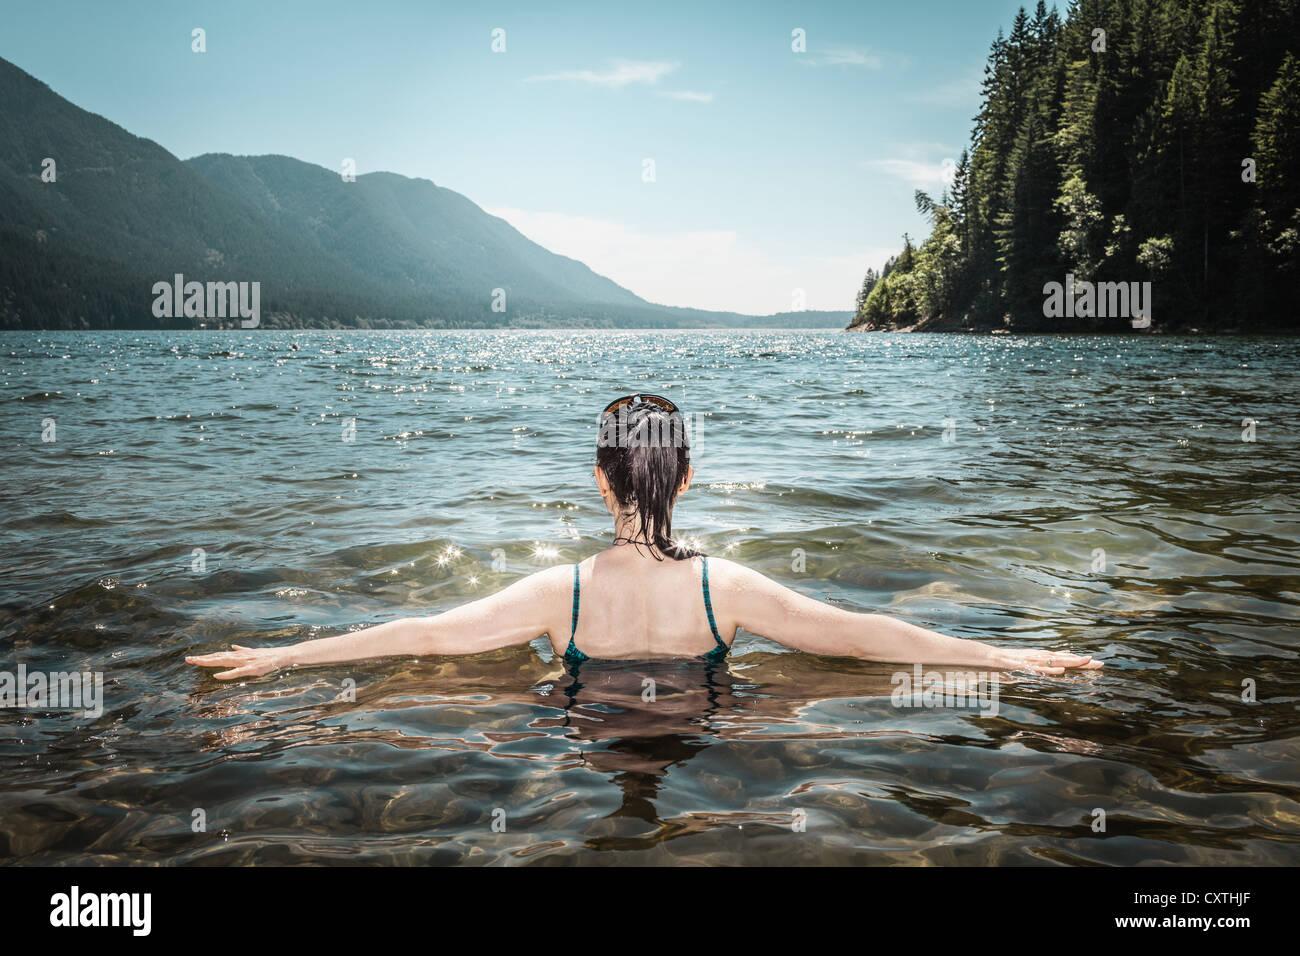 Woman walking in still lake - Stock Image